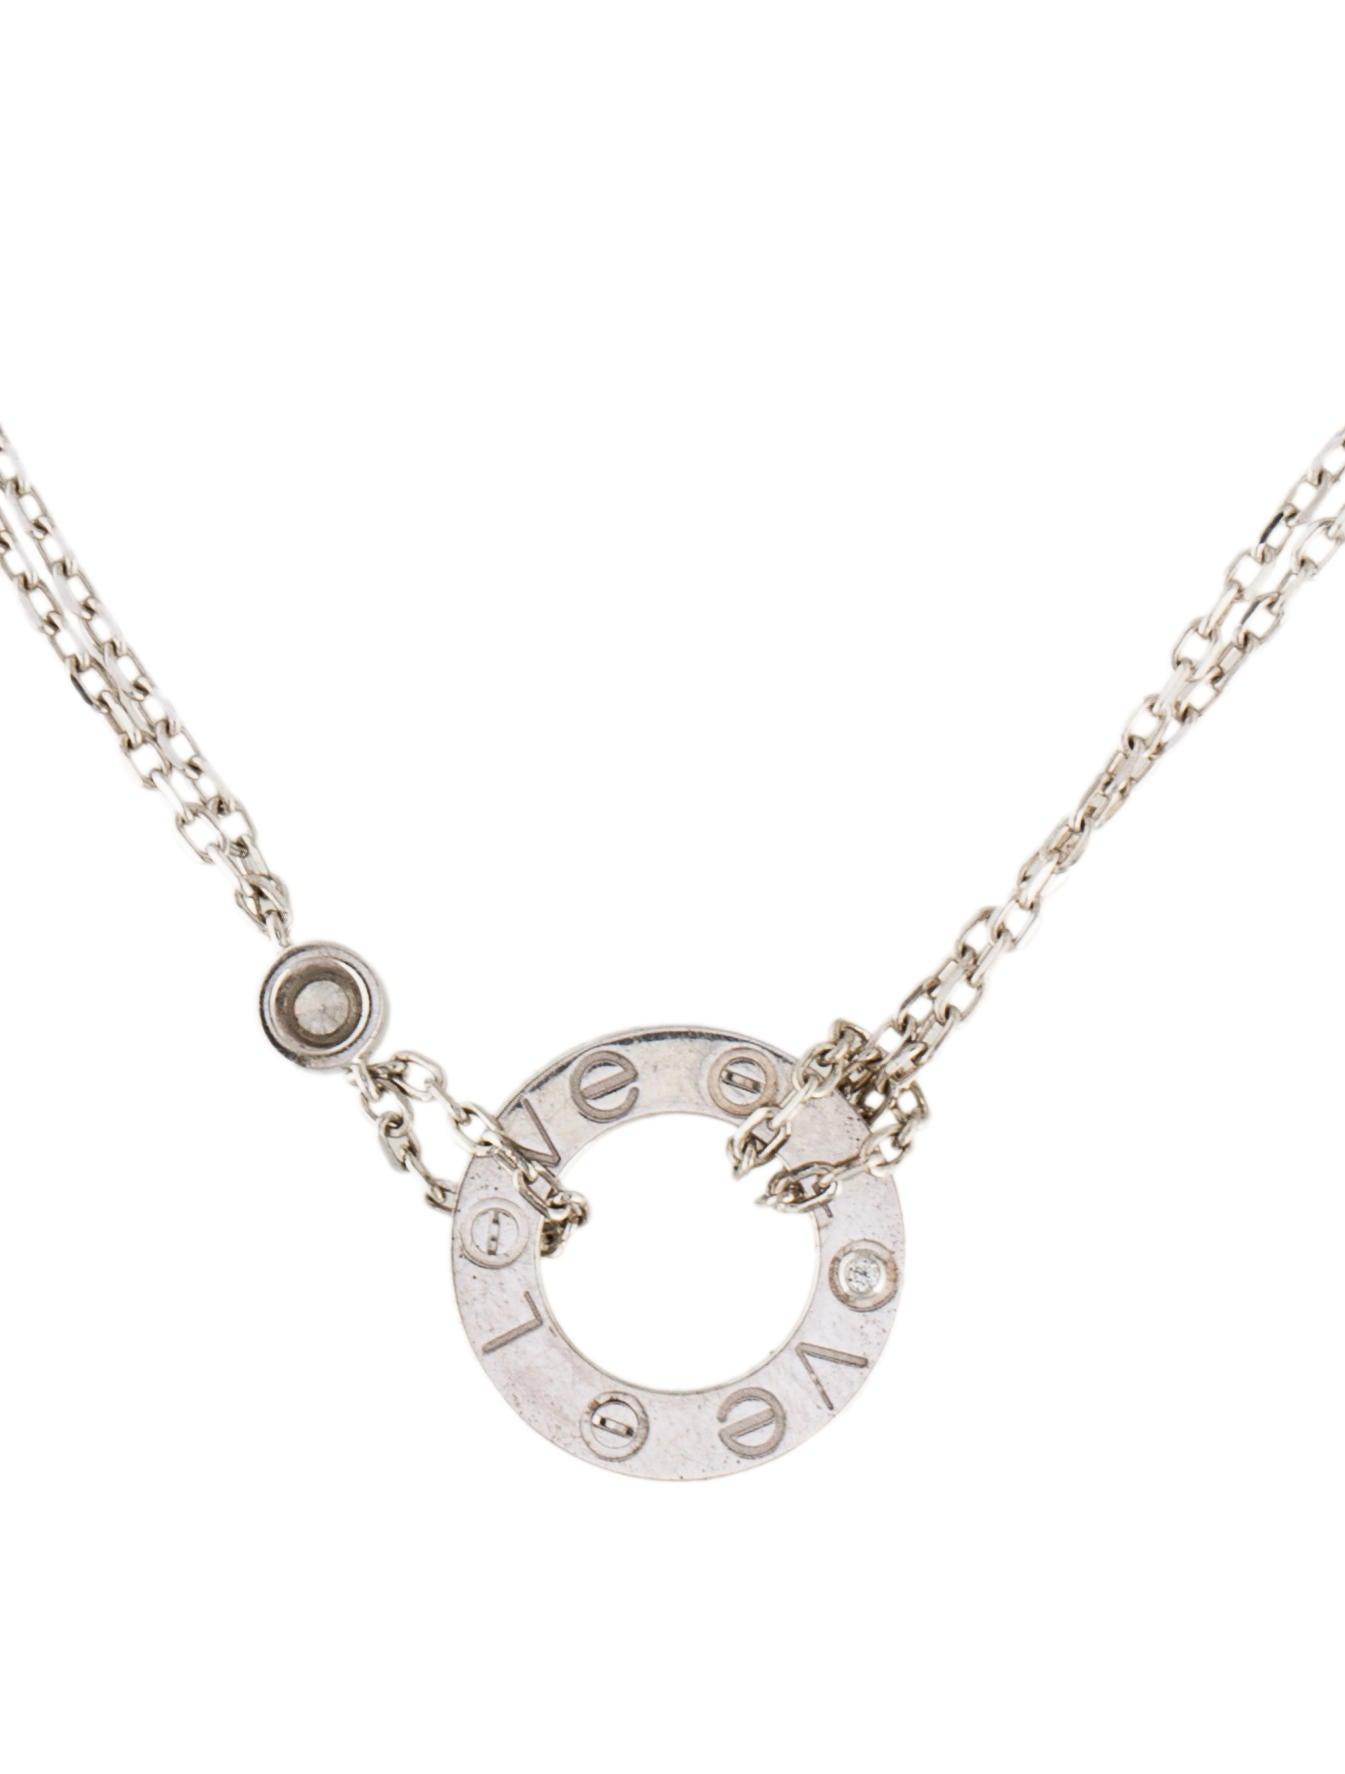 Cartier Diamond LOVE Necklace - Necklaces - CRT31091 | The ...